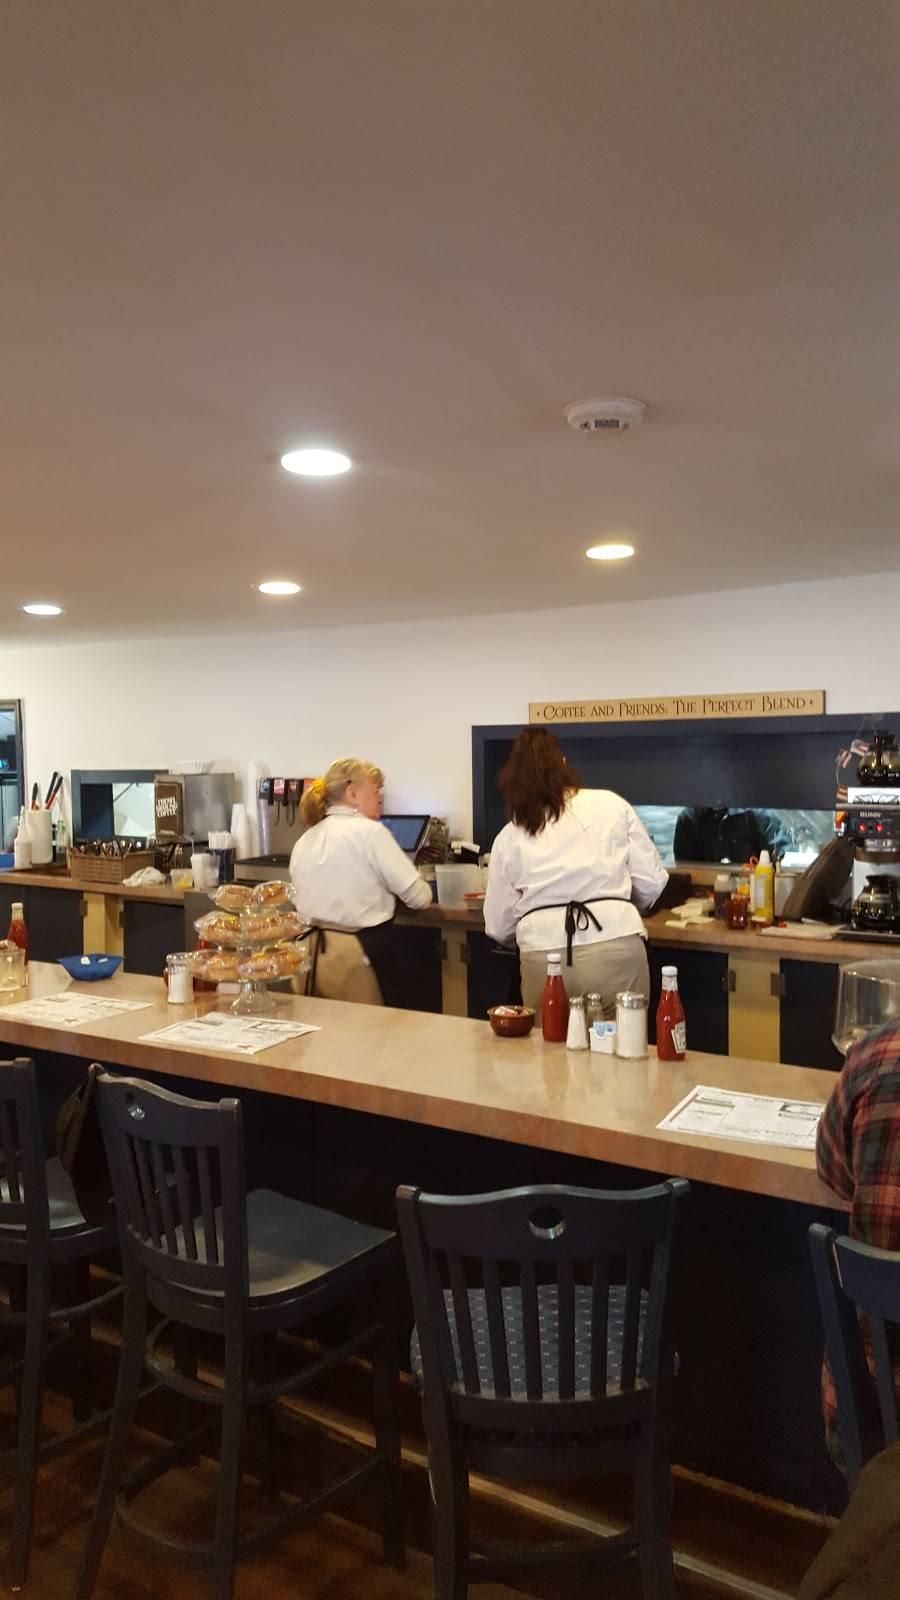 402 Café | restaurant | 2192 US-6, Hawley, PA 18428, USA | 5702265850 OR +1 570-226-5850